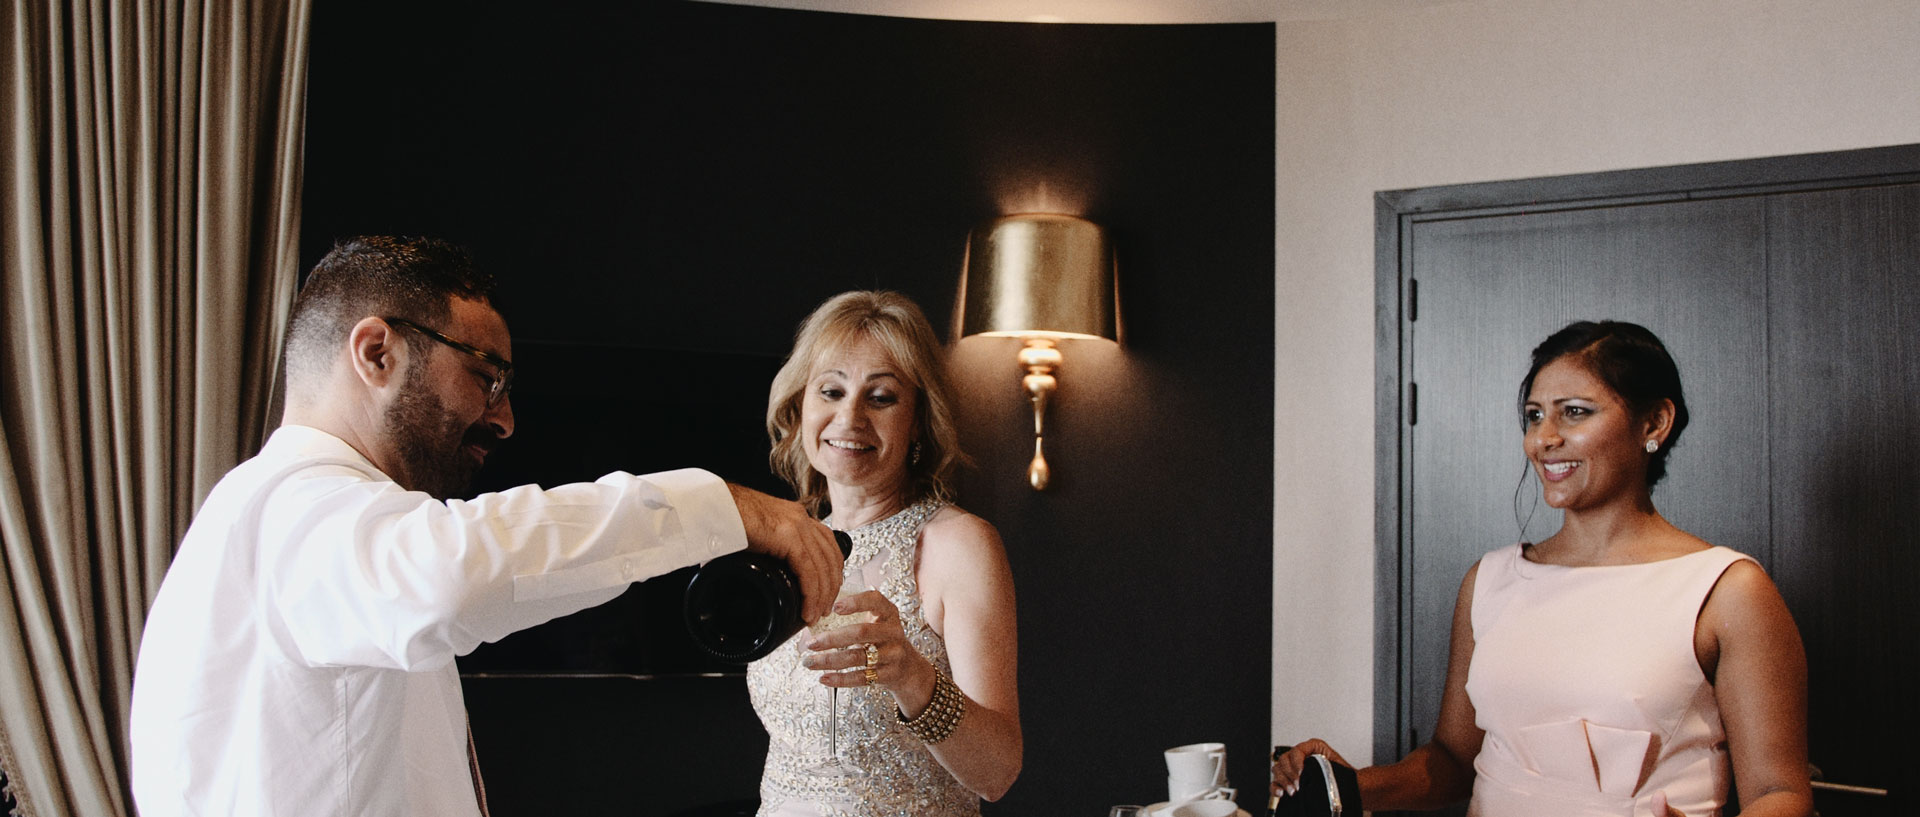 Natasha & Jad Wedding - Casino Biarritz (19).jpg